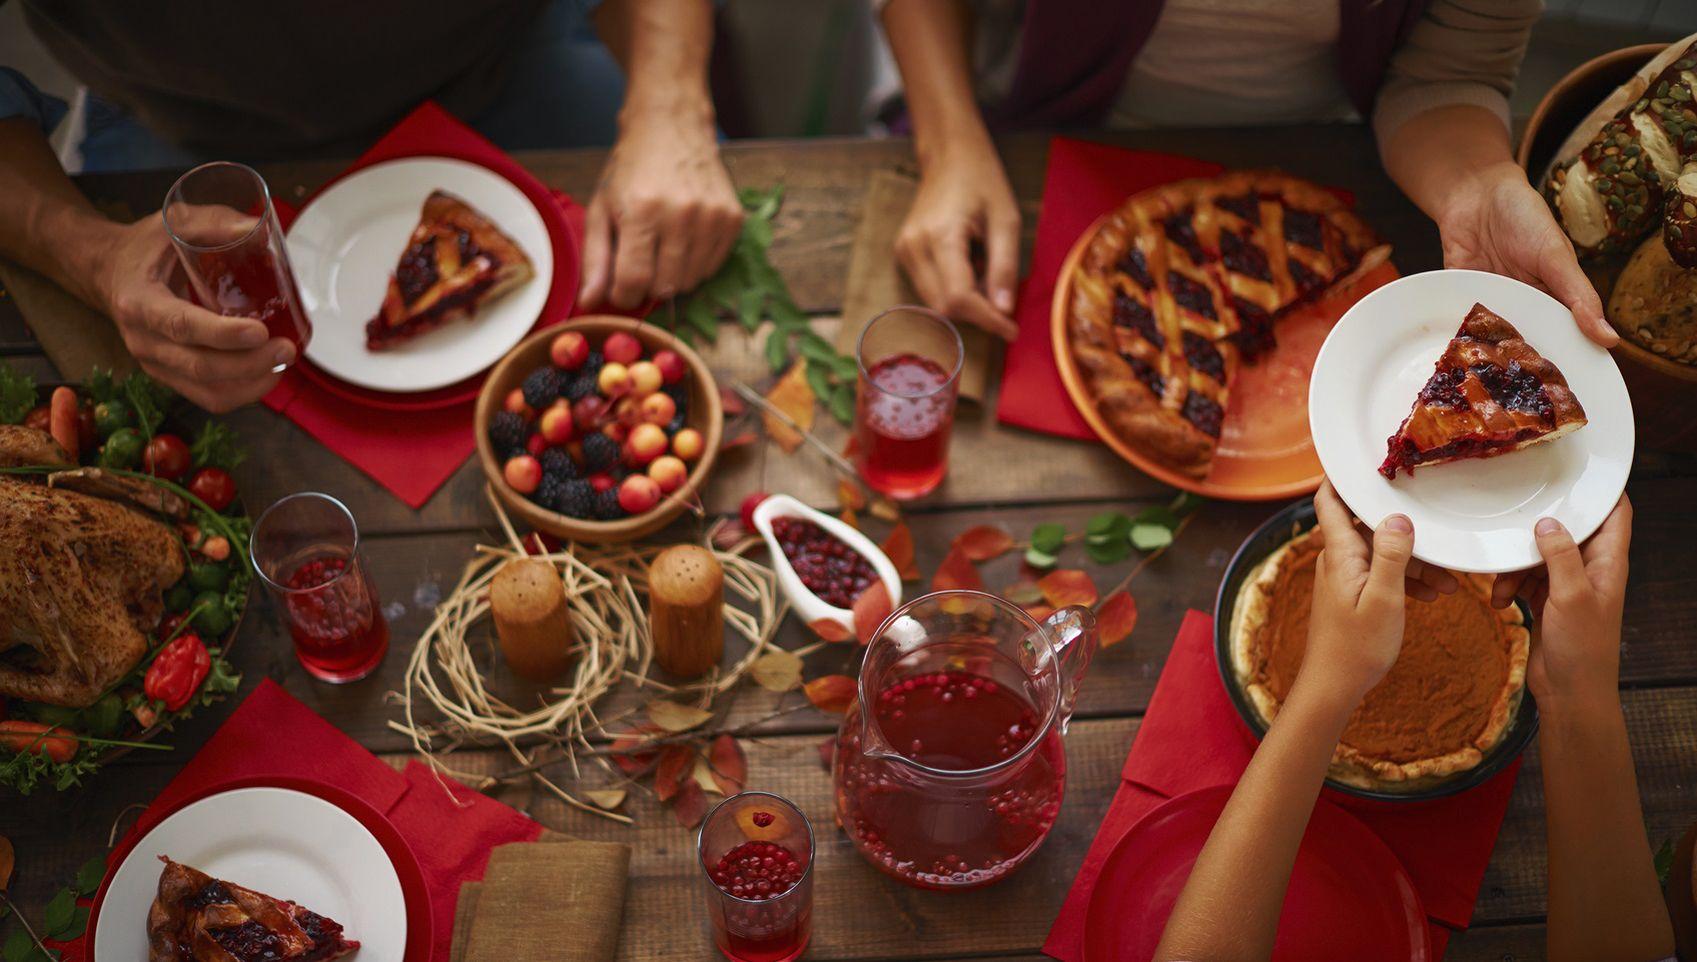 6 Diabetes-Friendly Holiday Desserts